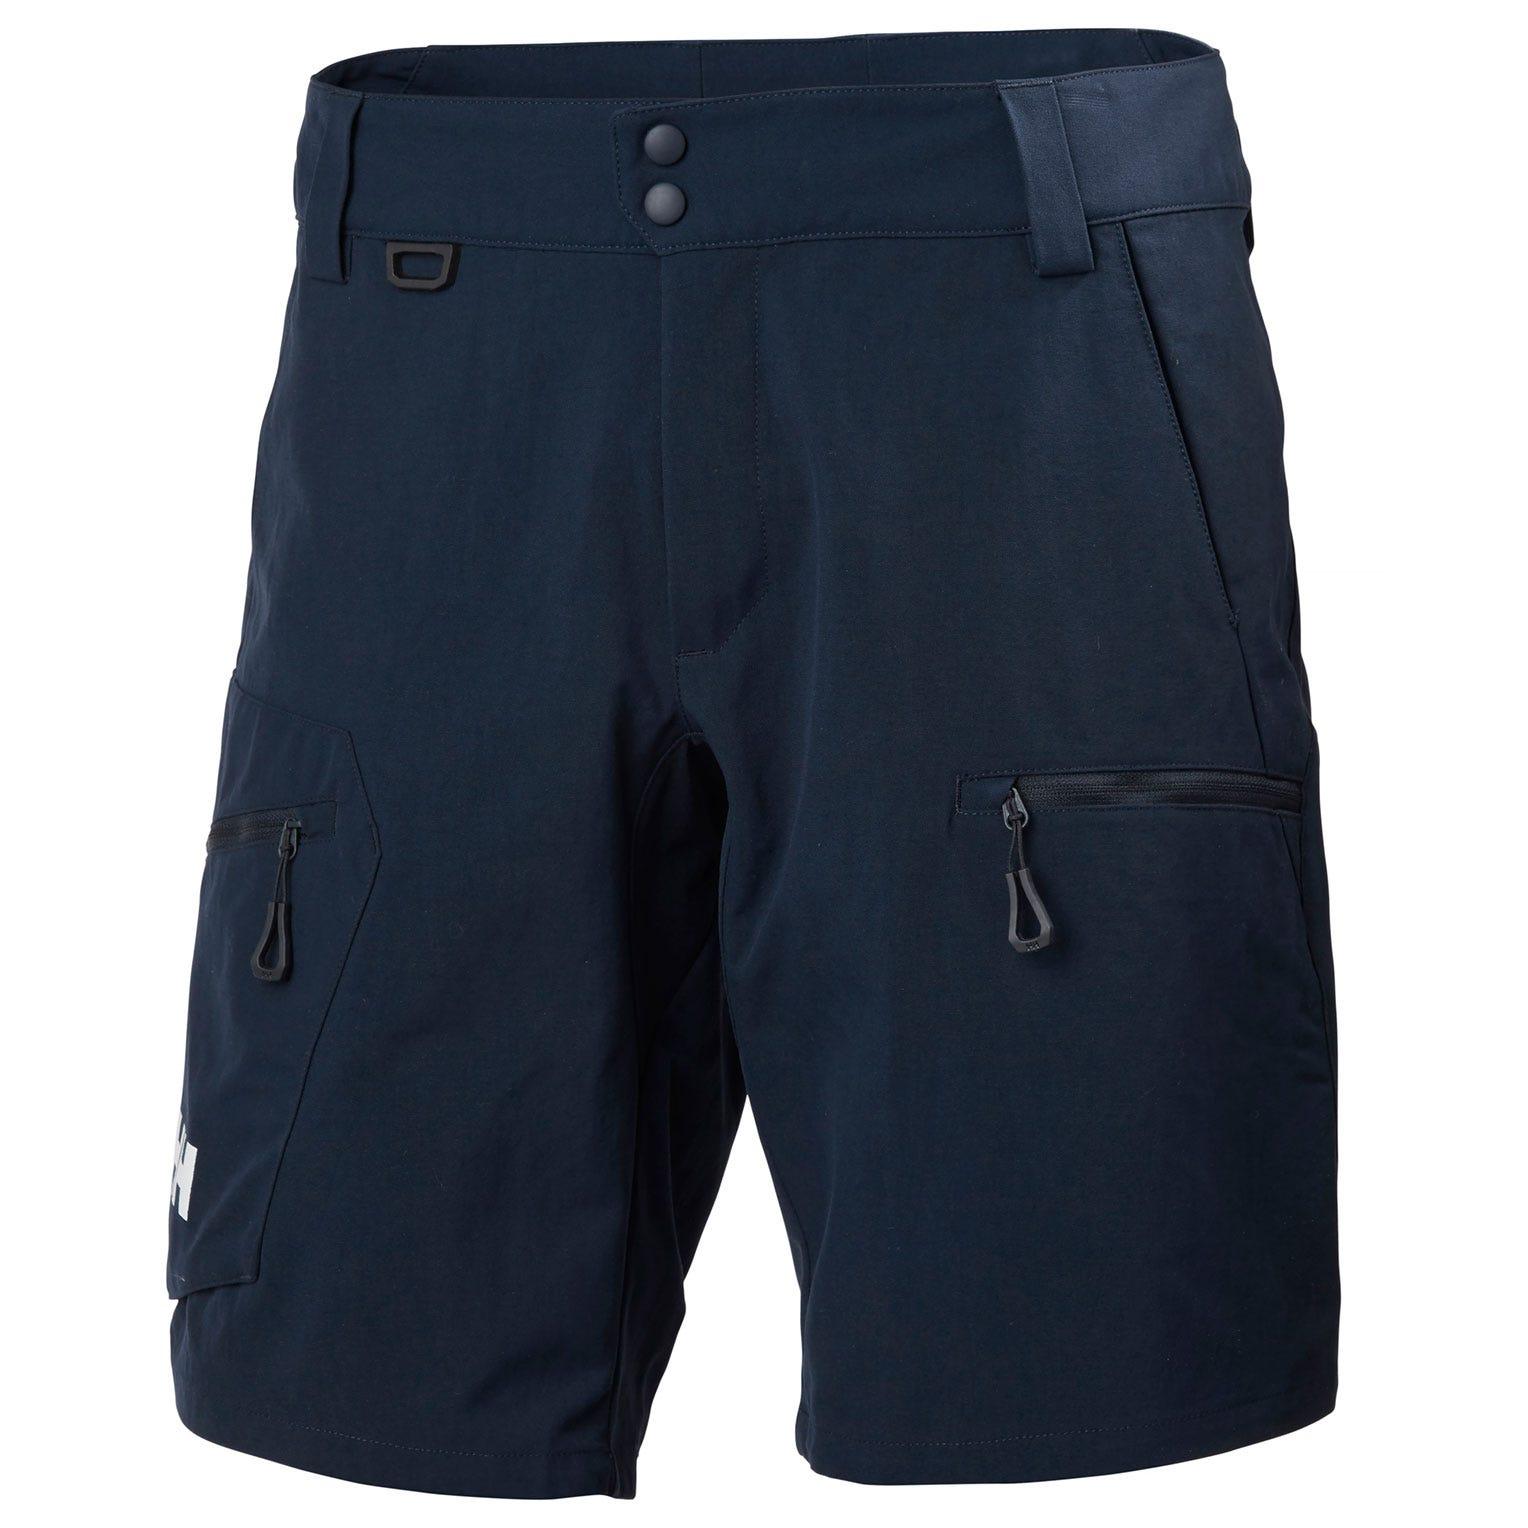 Helly Hansen Crewline Cargo Shorts Mens Sailing Pant Navy 34